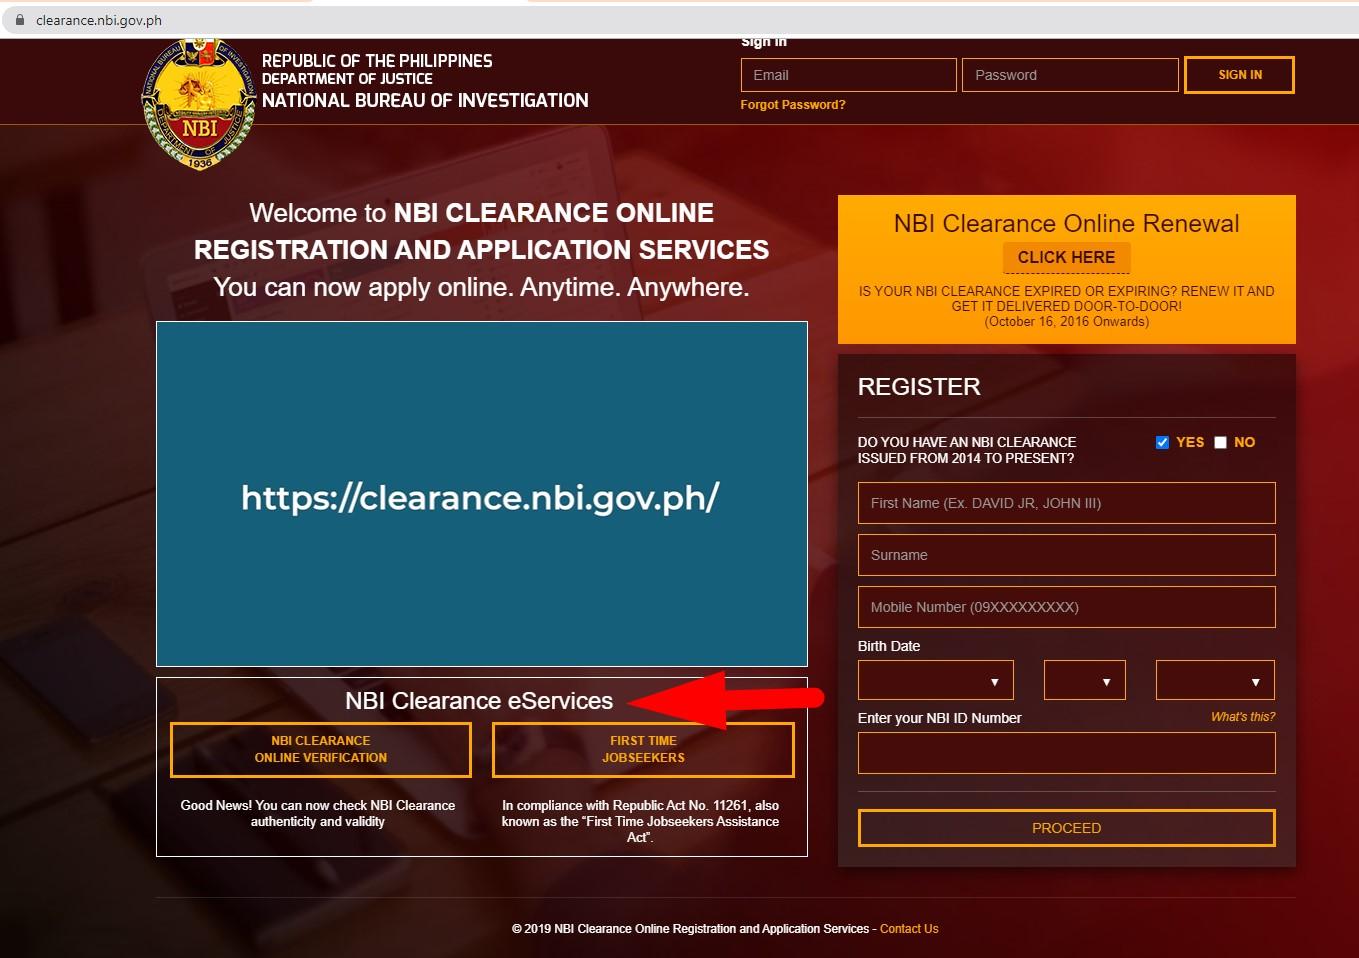 NBI CLEARANCE eSERVICES nbi clearance eservices NBI CLEARANCE eSERVICES FOR 2021 NBI CLEARANCE eSERVICES